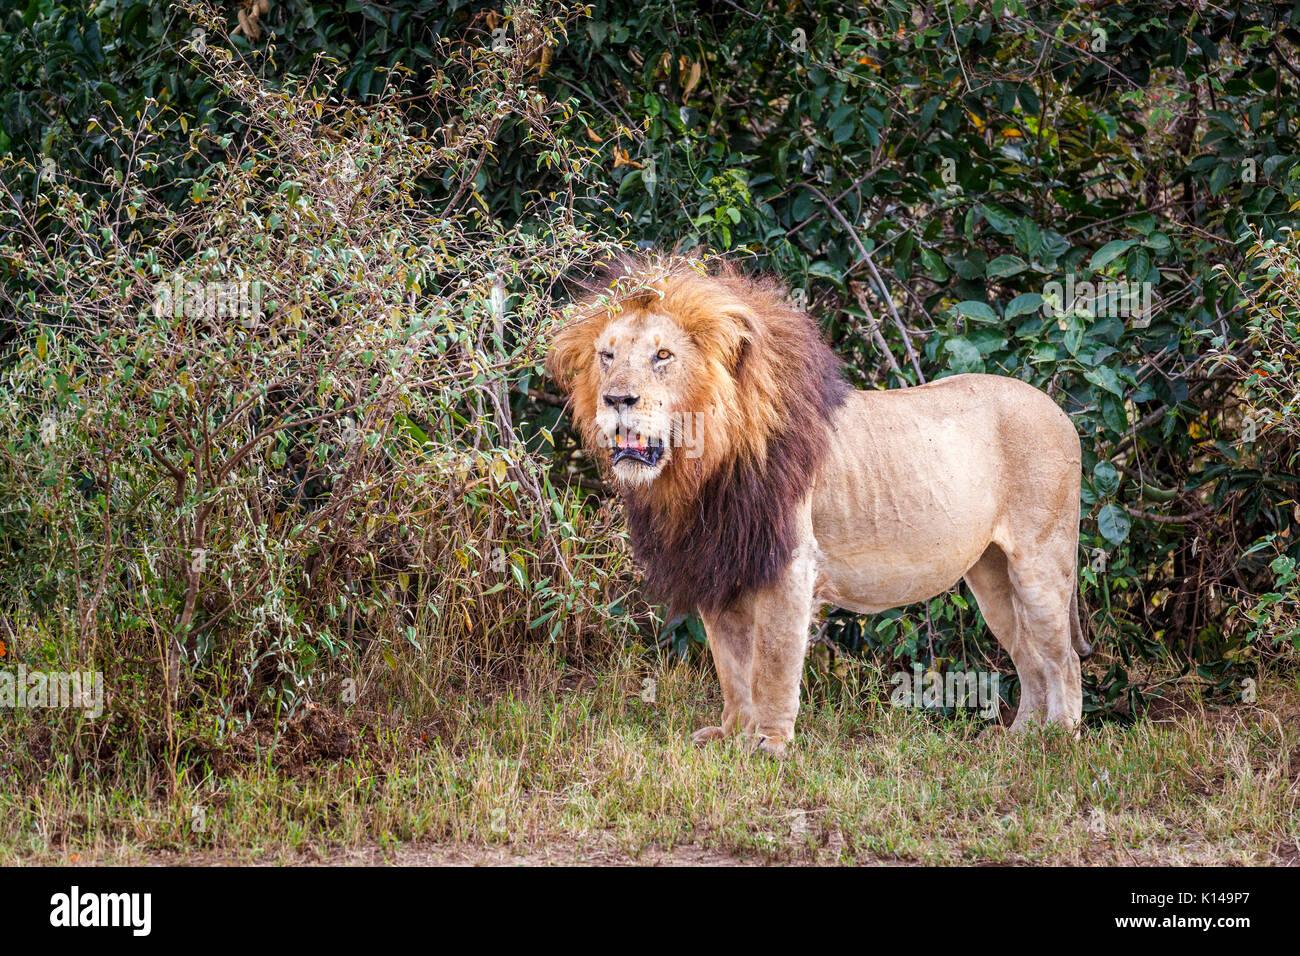 Solitary male Mara lion (Panthera leo) standing in scrubland, Masai Mara, Kenya - Stock Image